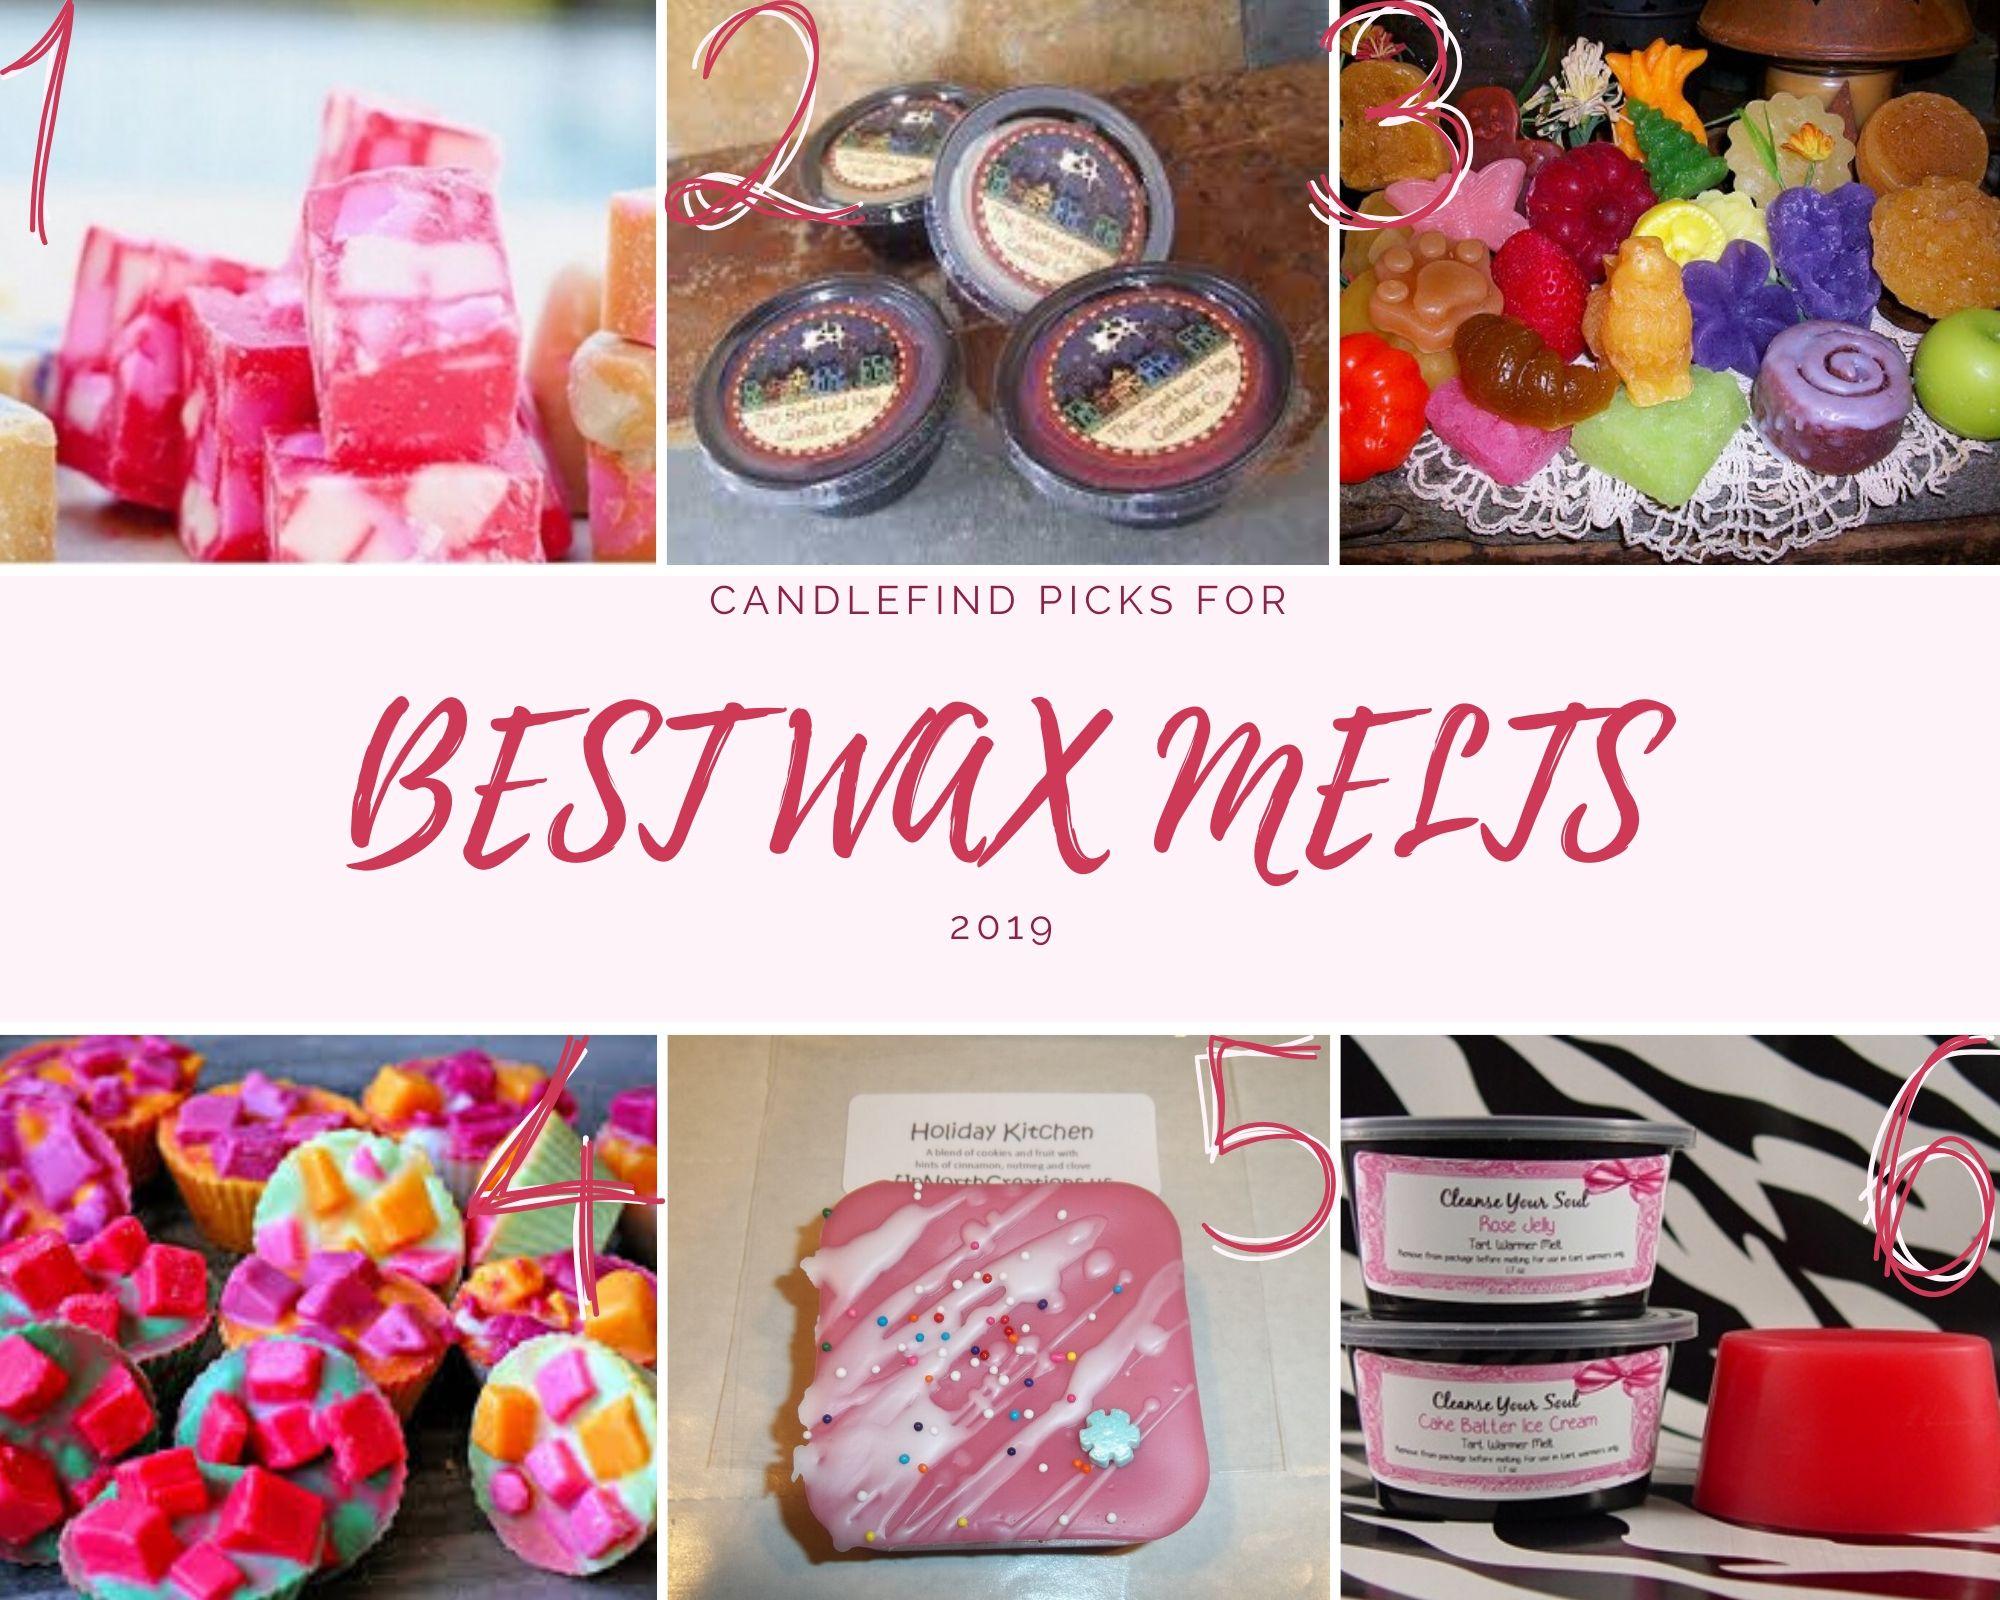 best wax nelts